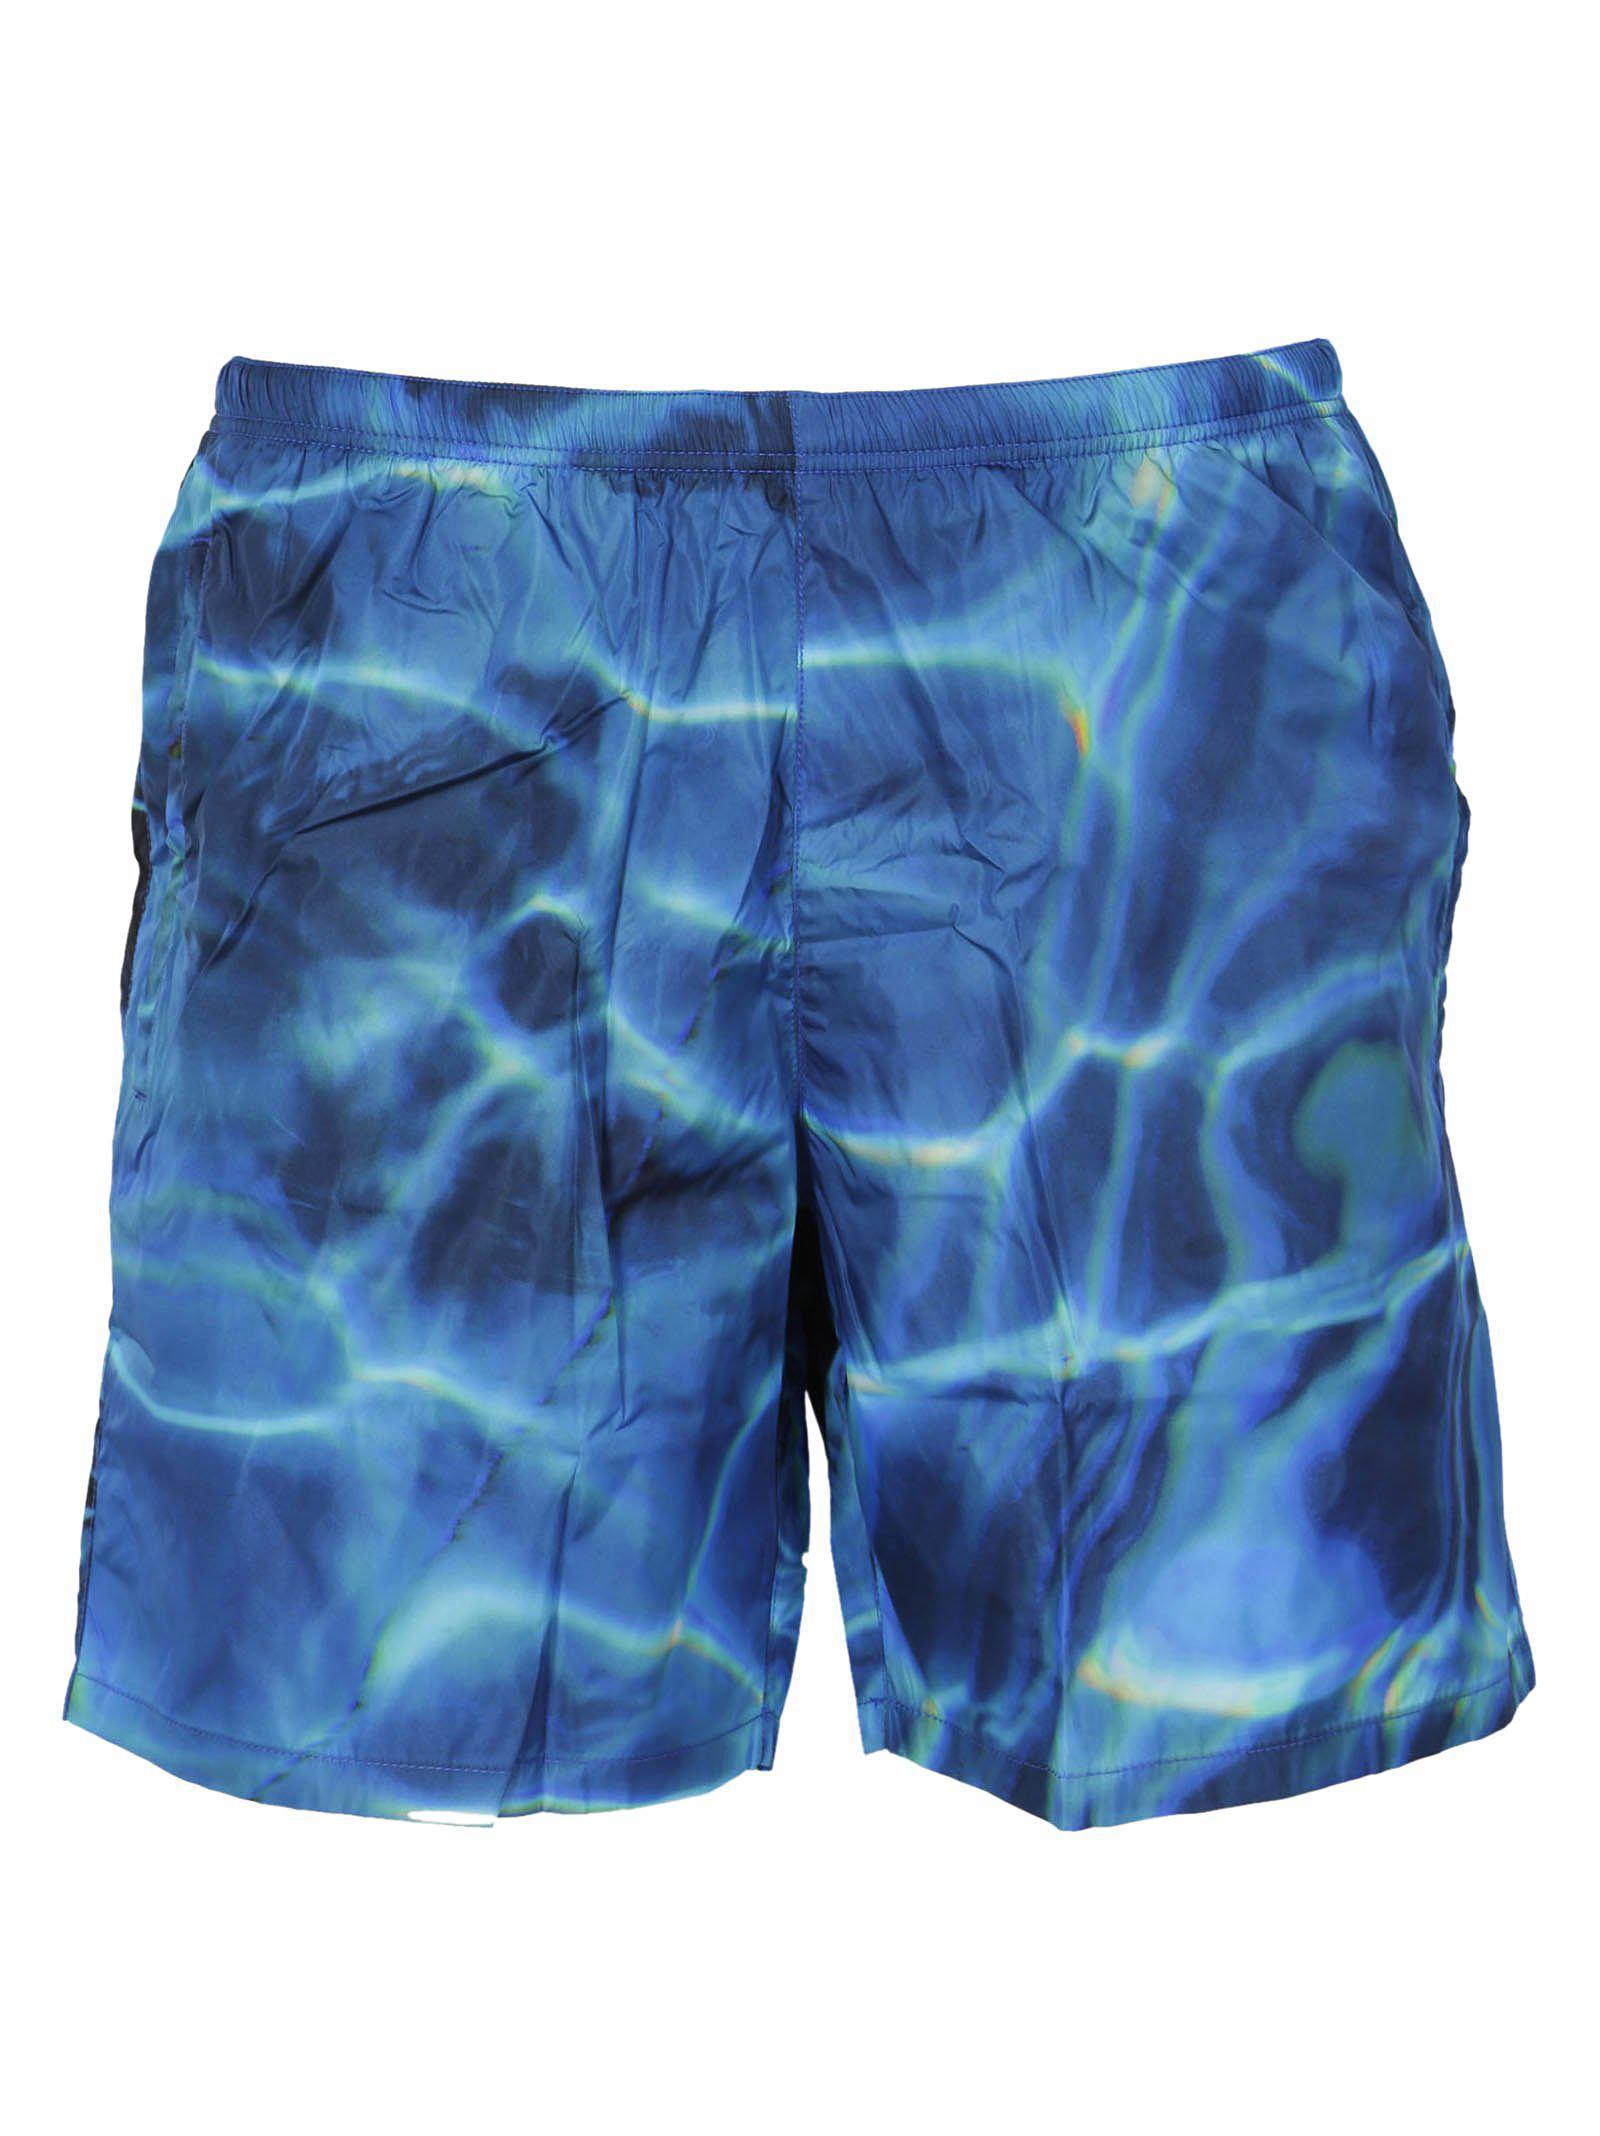 4769e972e1 Prada Printed Swim Shorts in Blue for Men - Lyst